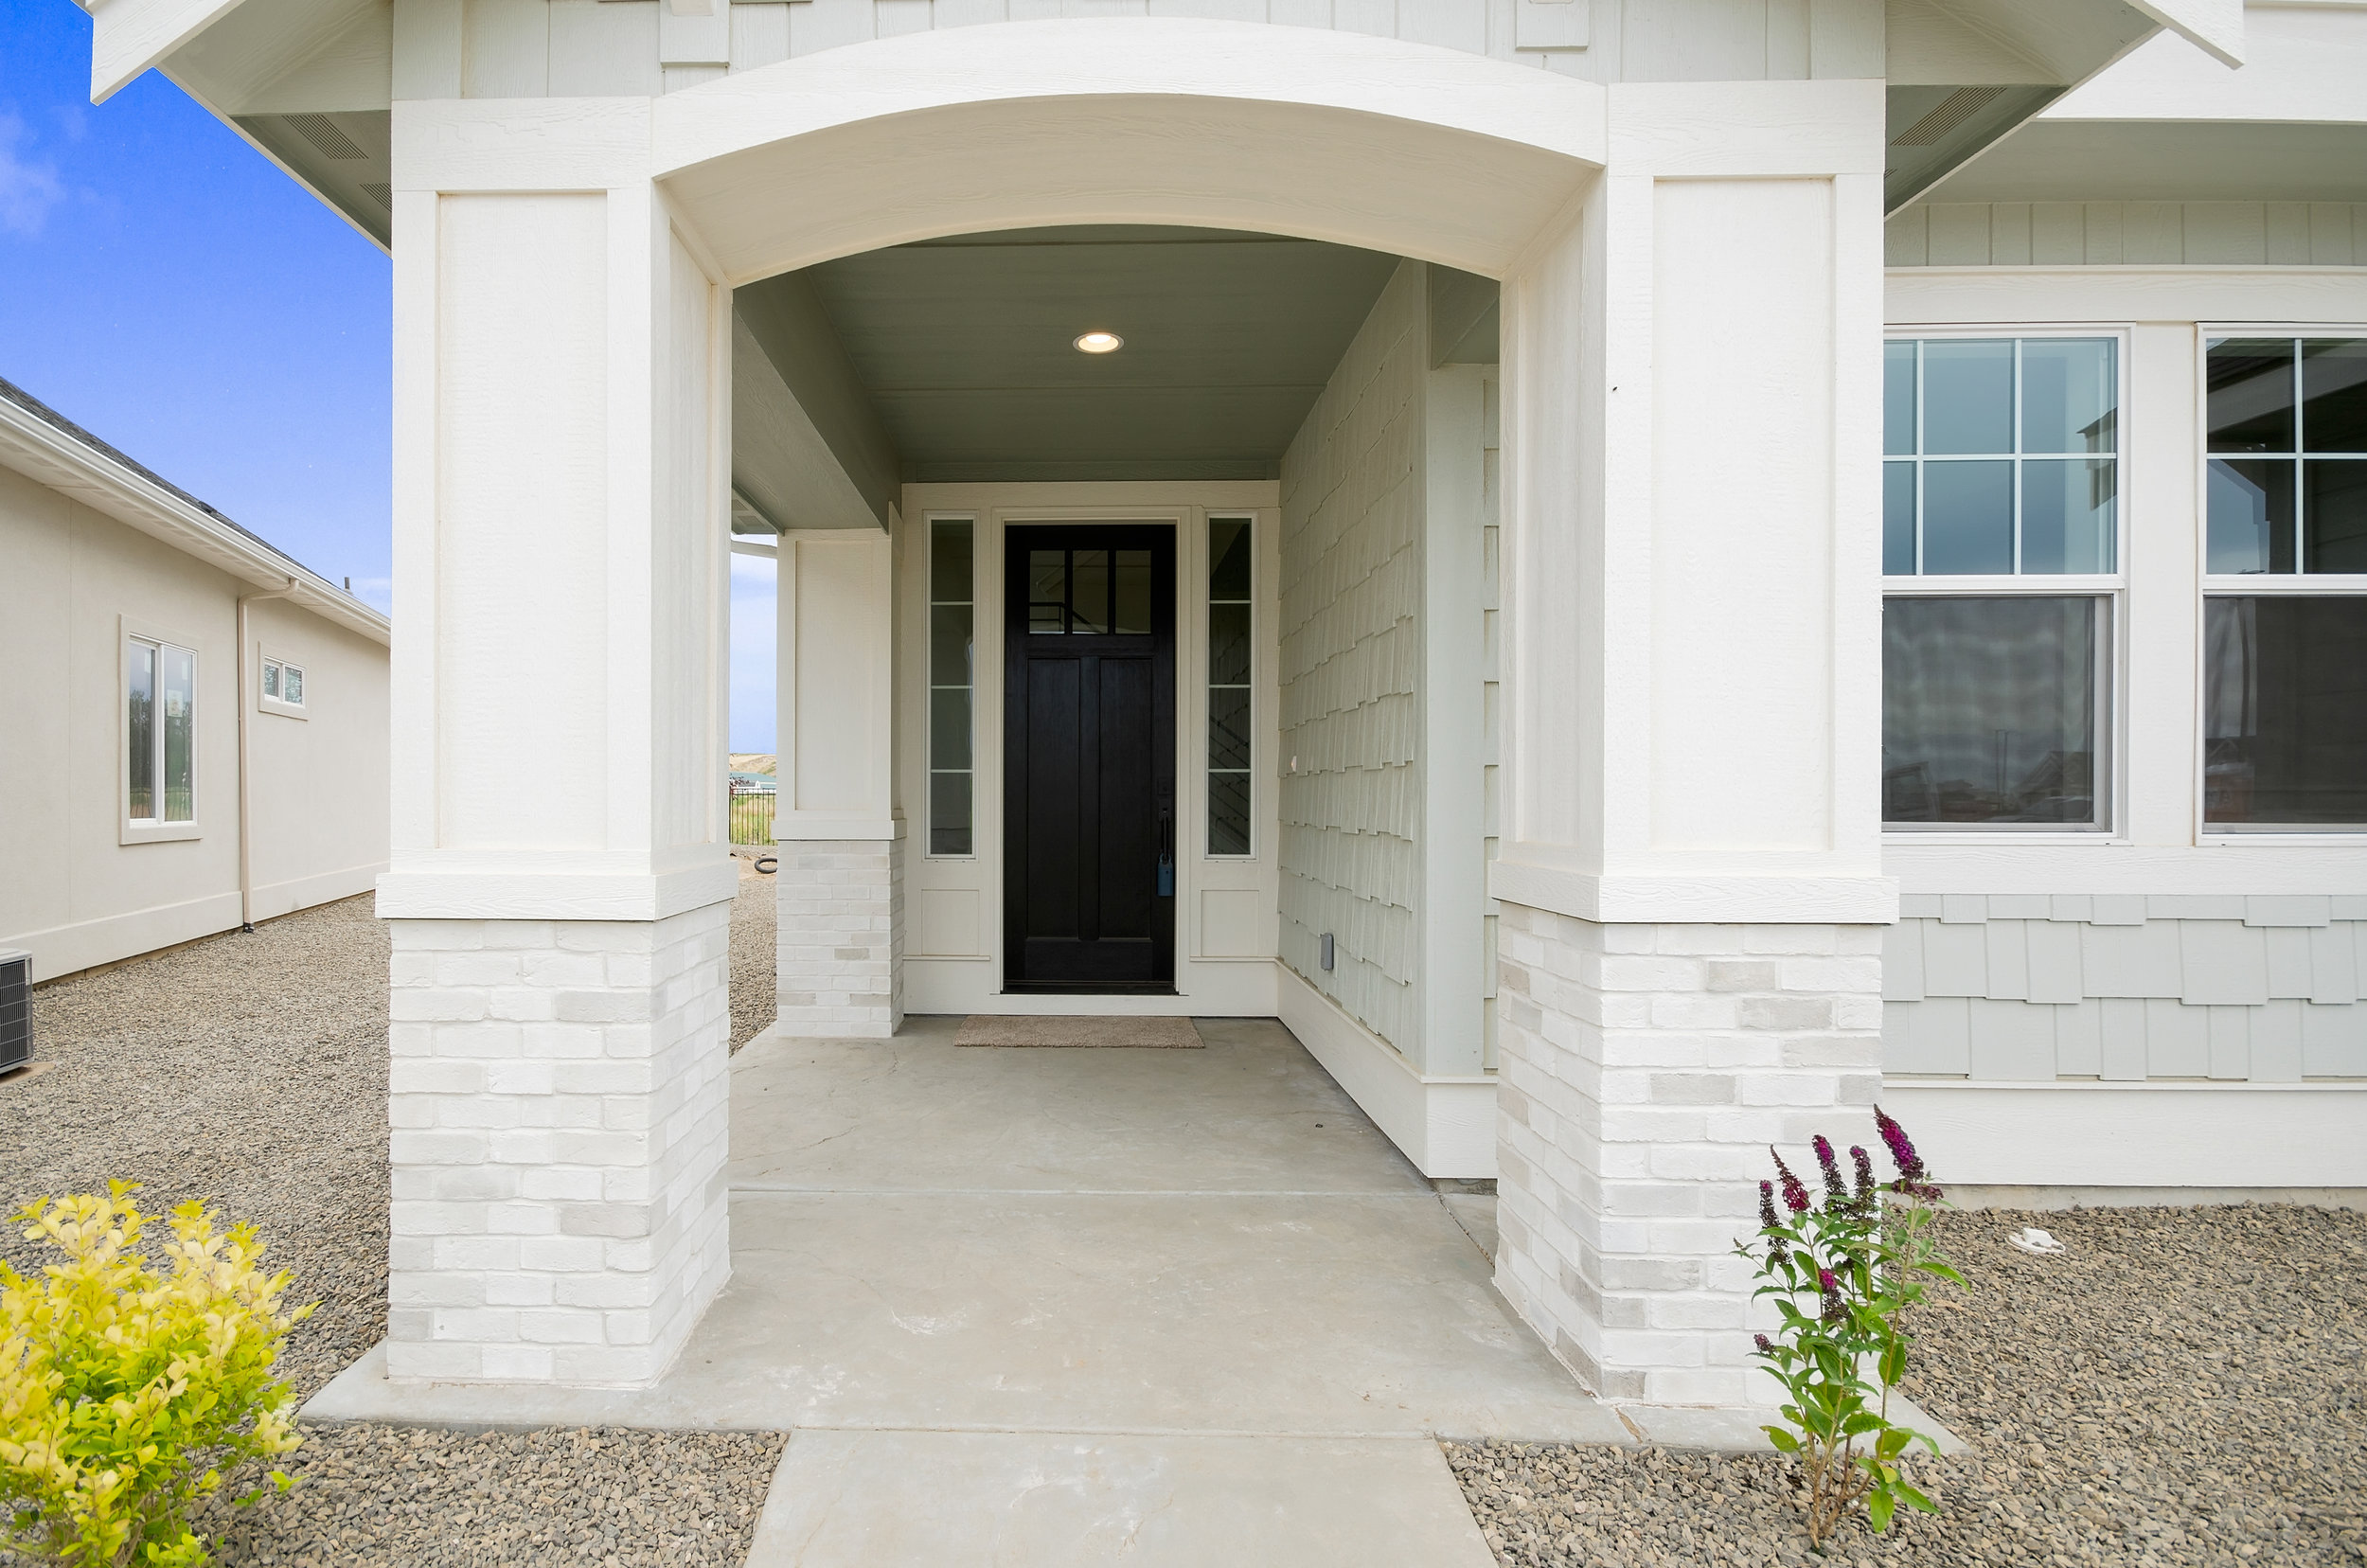 04-Exterior Entrance.jpg